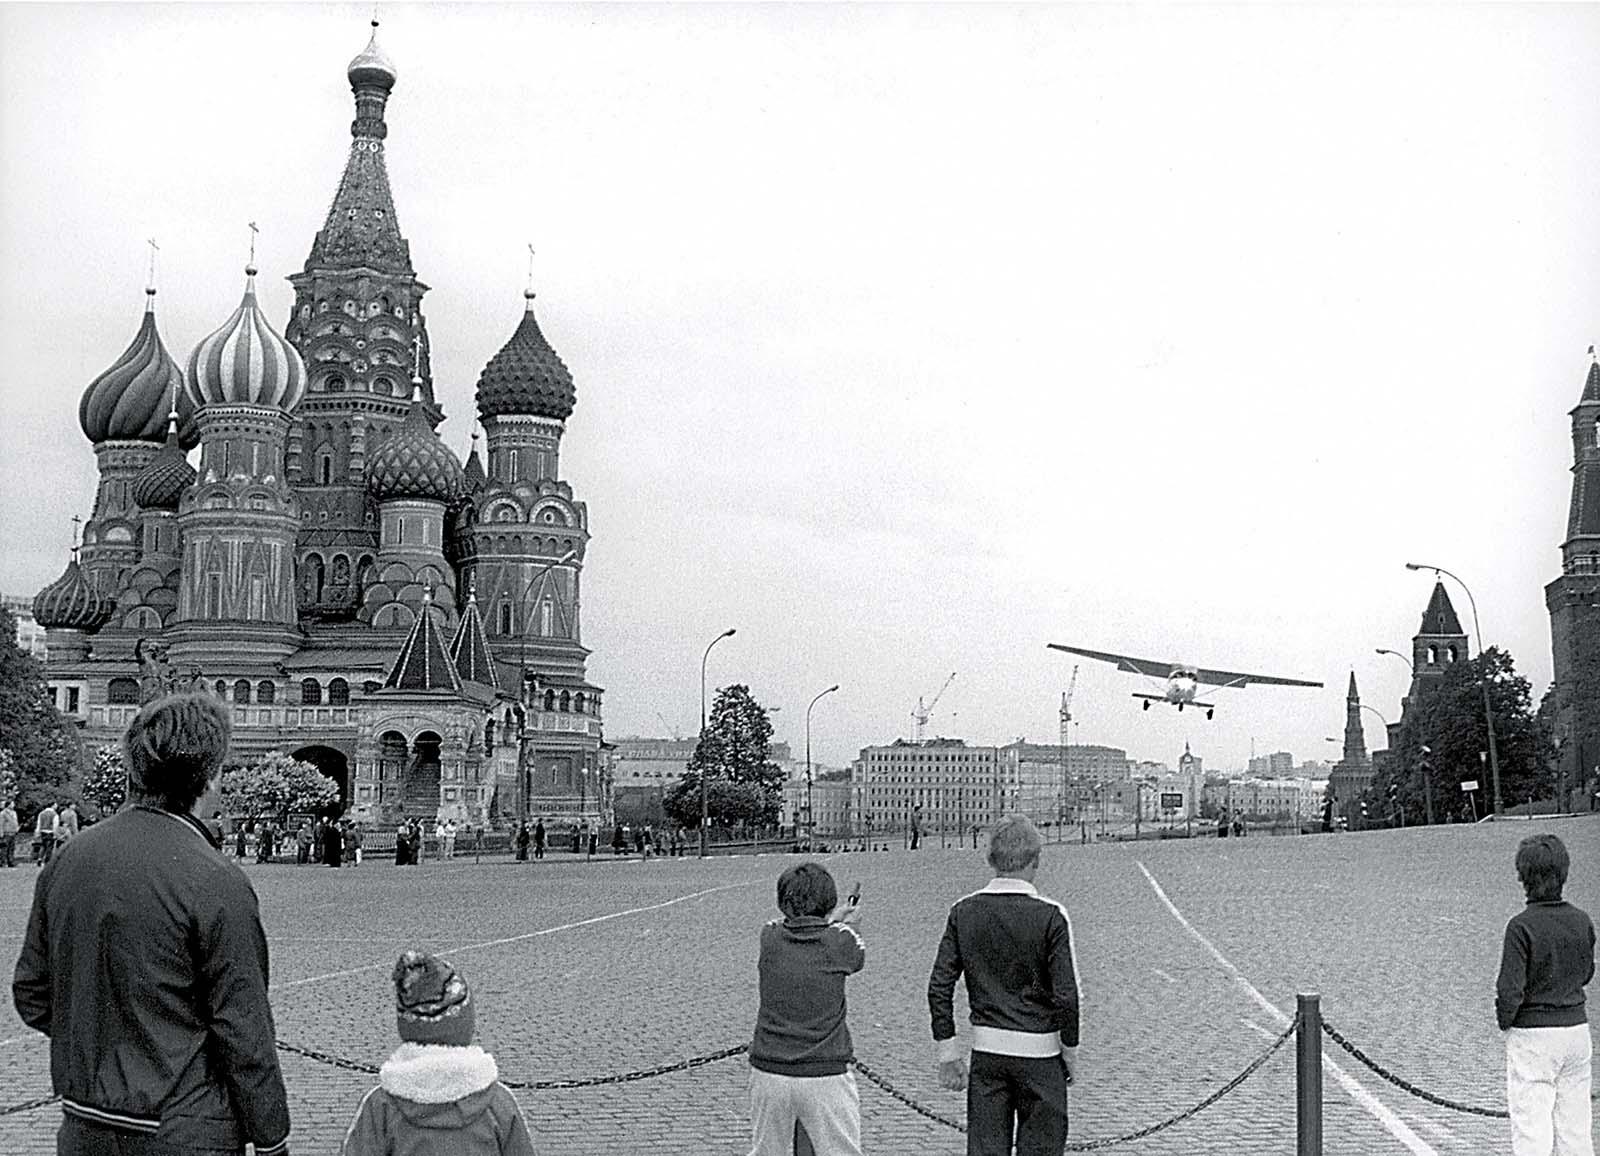 Rustovo ppristátie náhodou zachytil jeden z turistov. (Foto: archív)